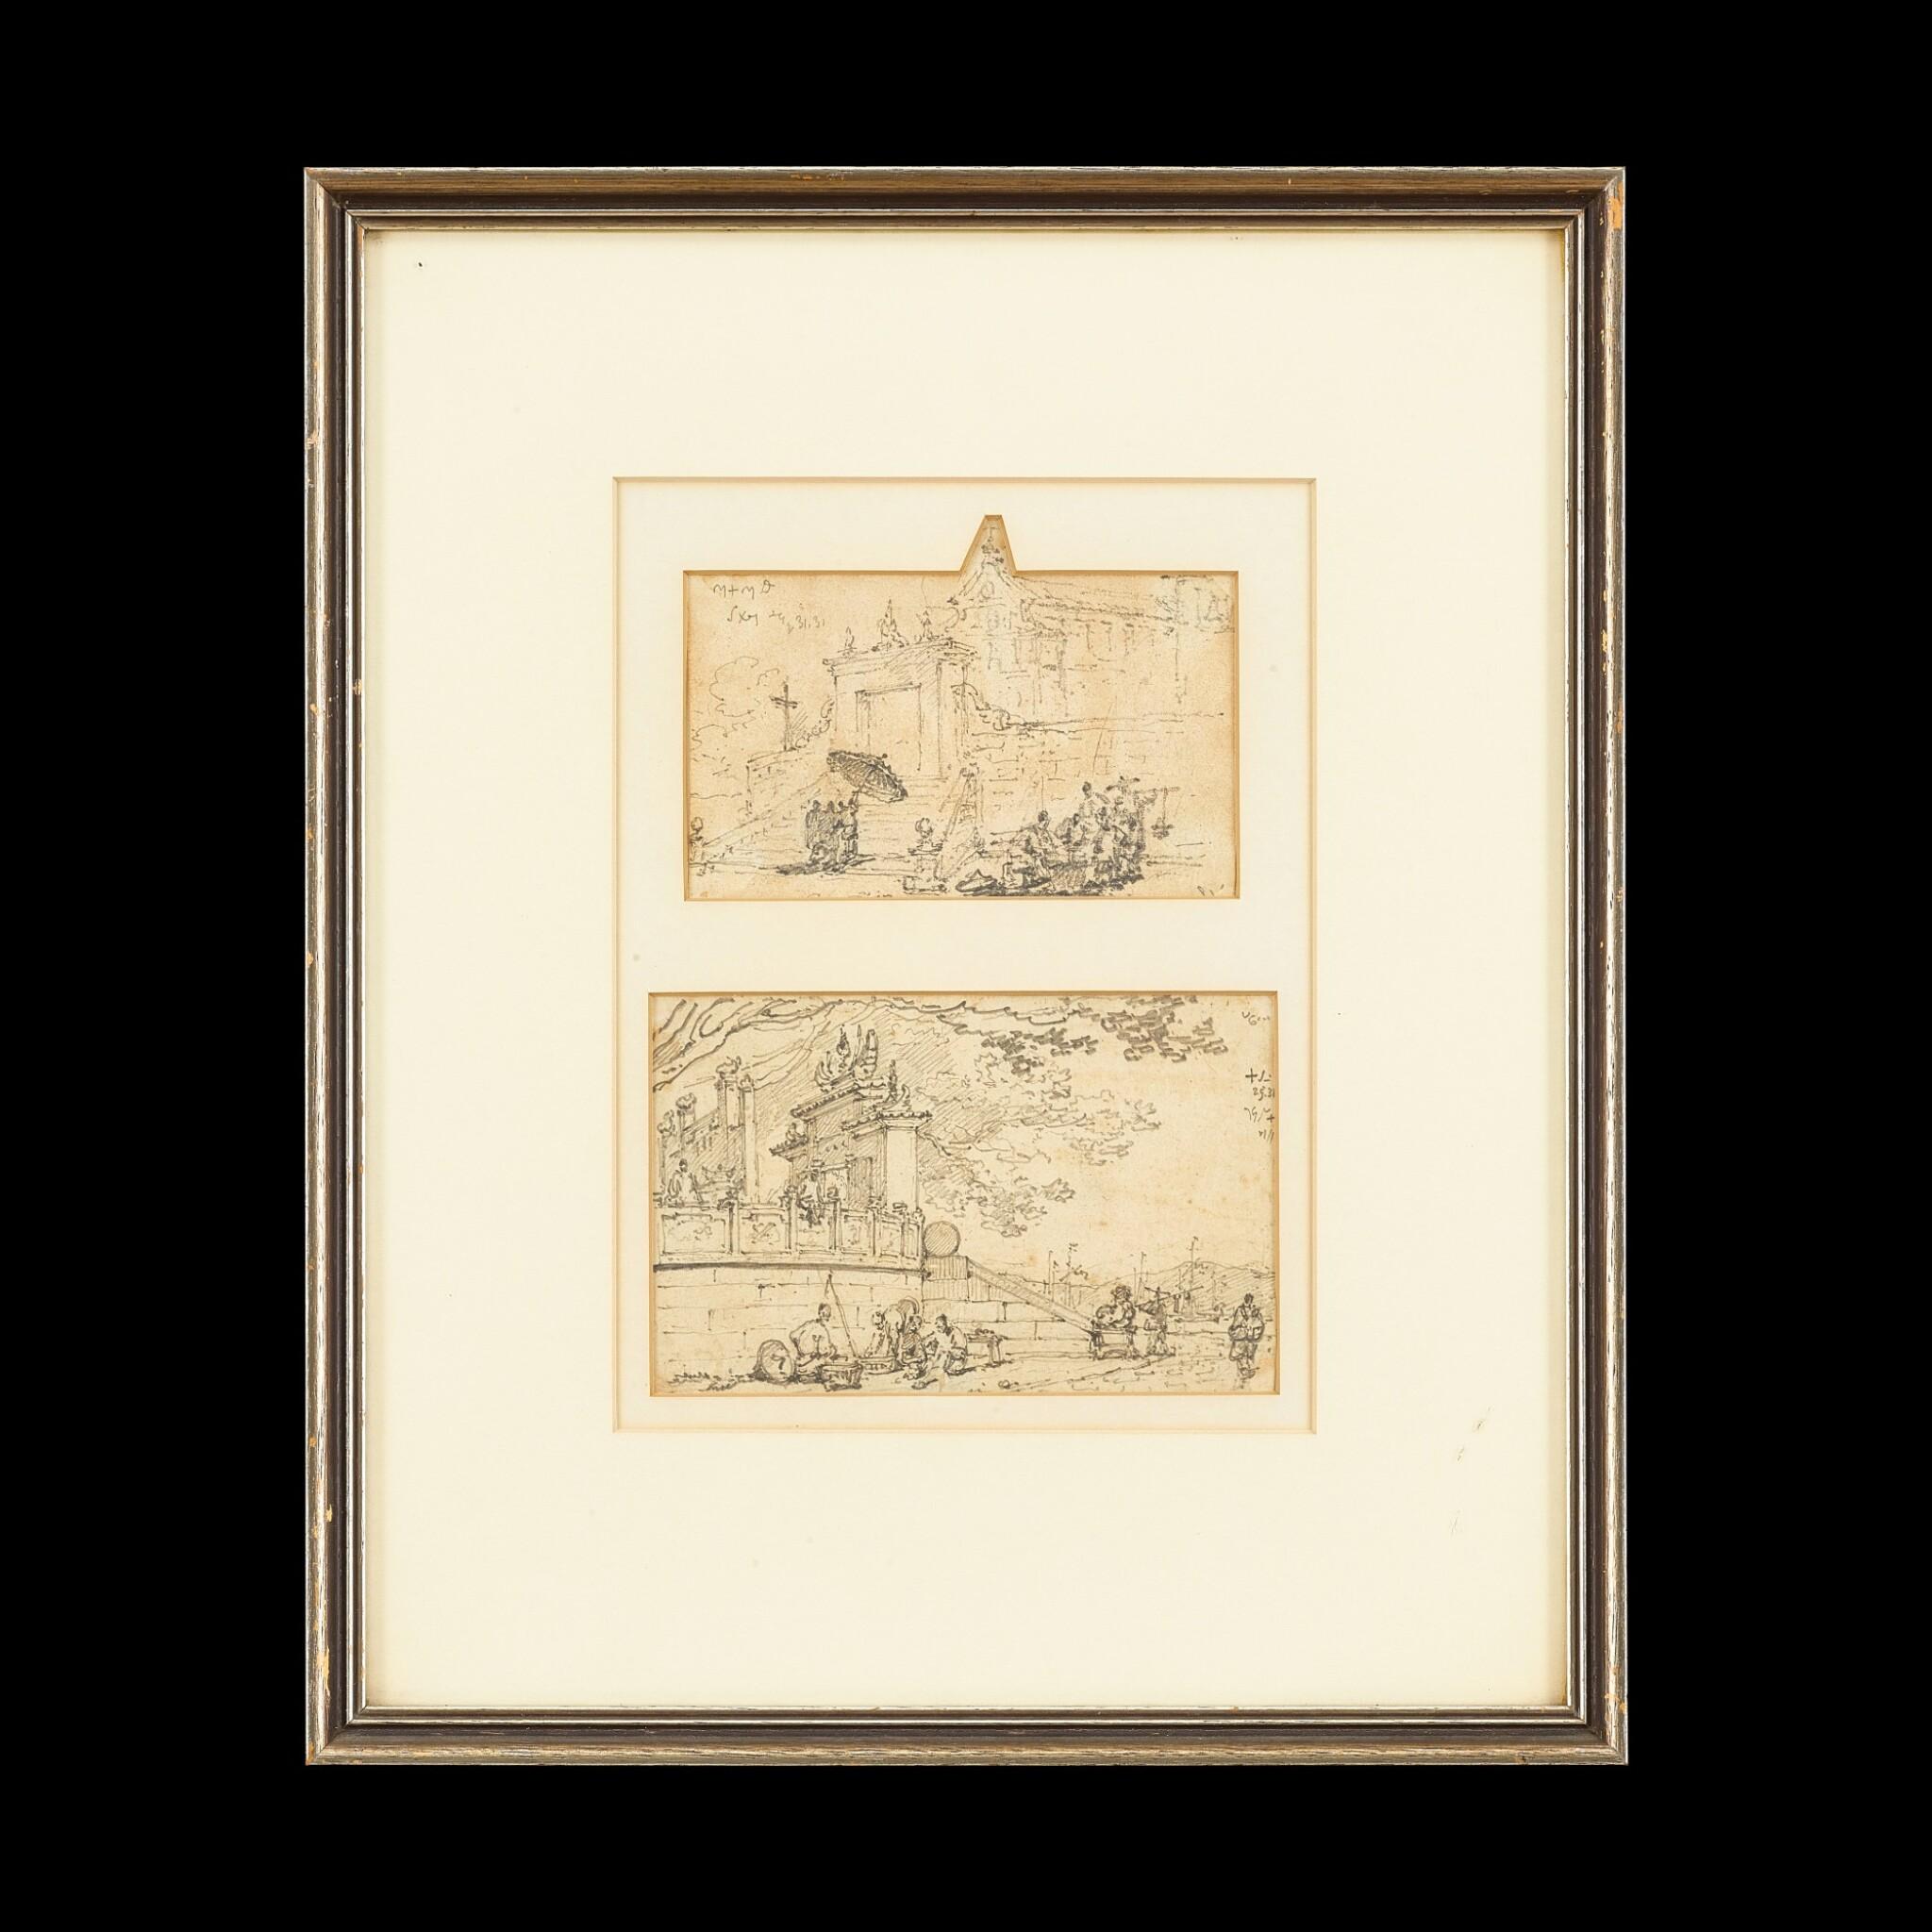 View full screen - View 1 of Lot 203. George Chinnery (1774-1852) Two Sketches of Macau   錢納利(1774-1852年)   素描澳門人物風景圖兩幅 紙本鉛筆 鏡框.